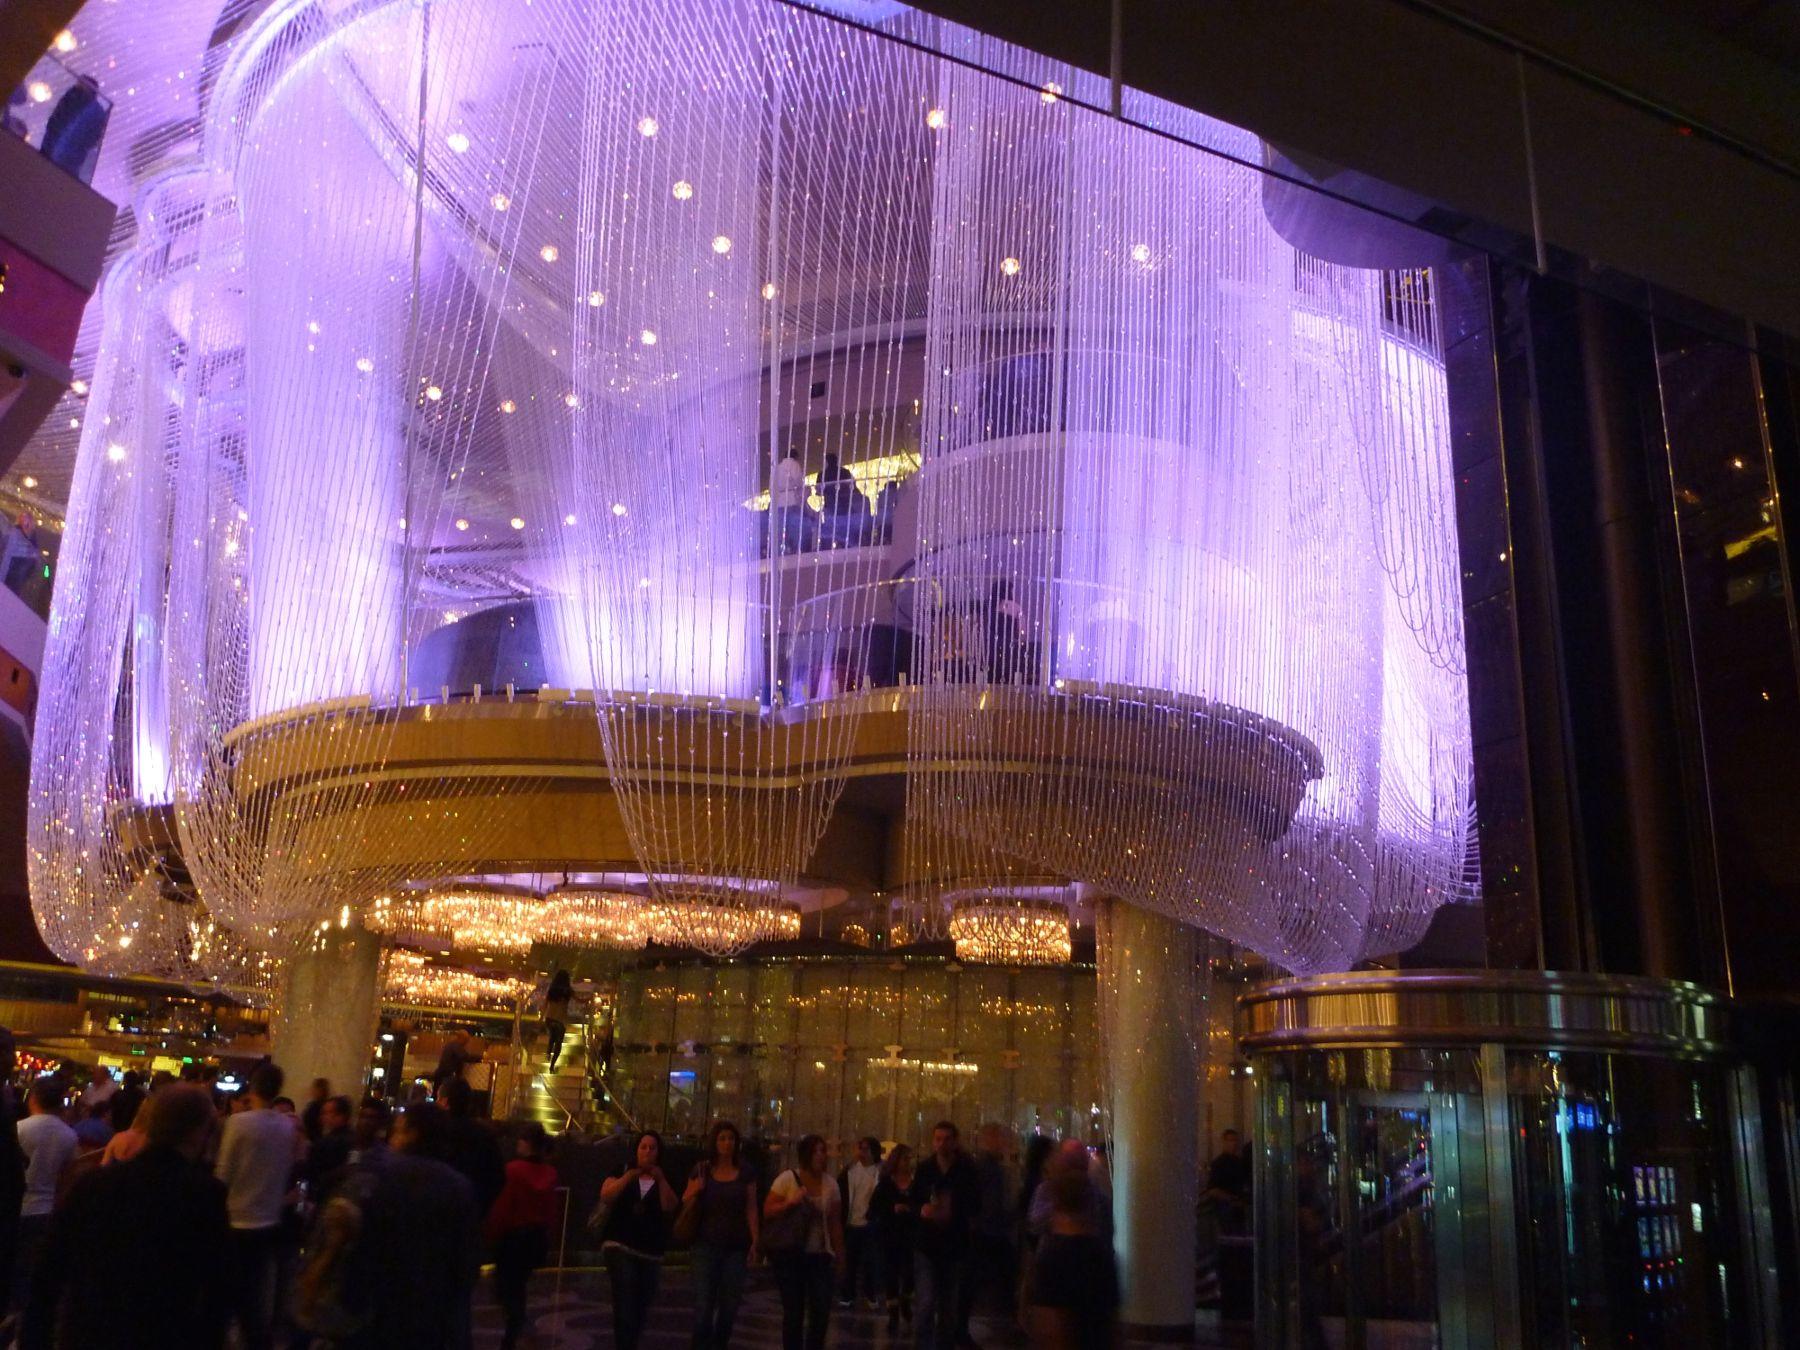 Crystal Clear Chandelier Bar Cosmopolitan Hotel Resort The Chandeliercrystal Chandelierslas Vegas